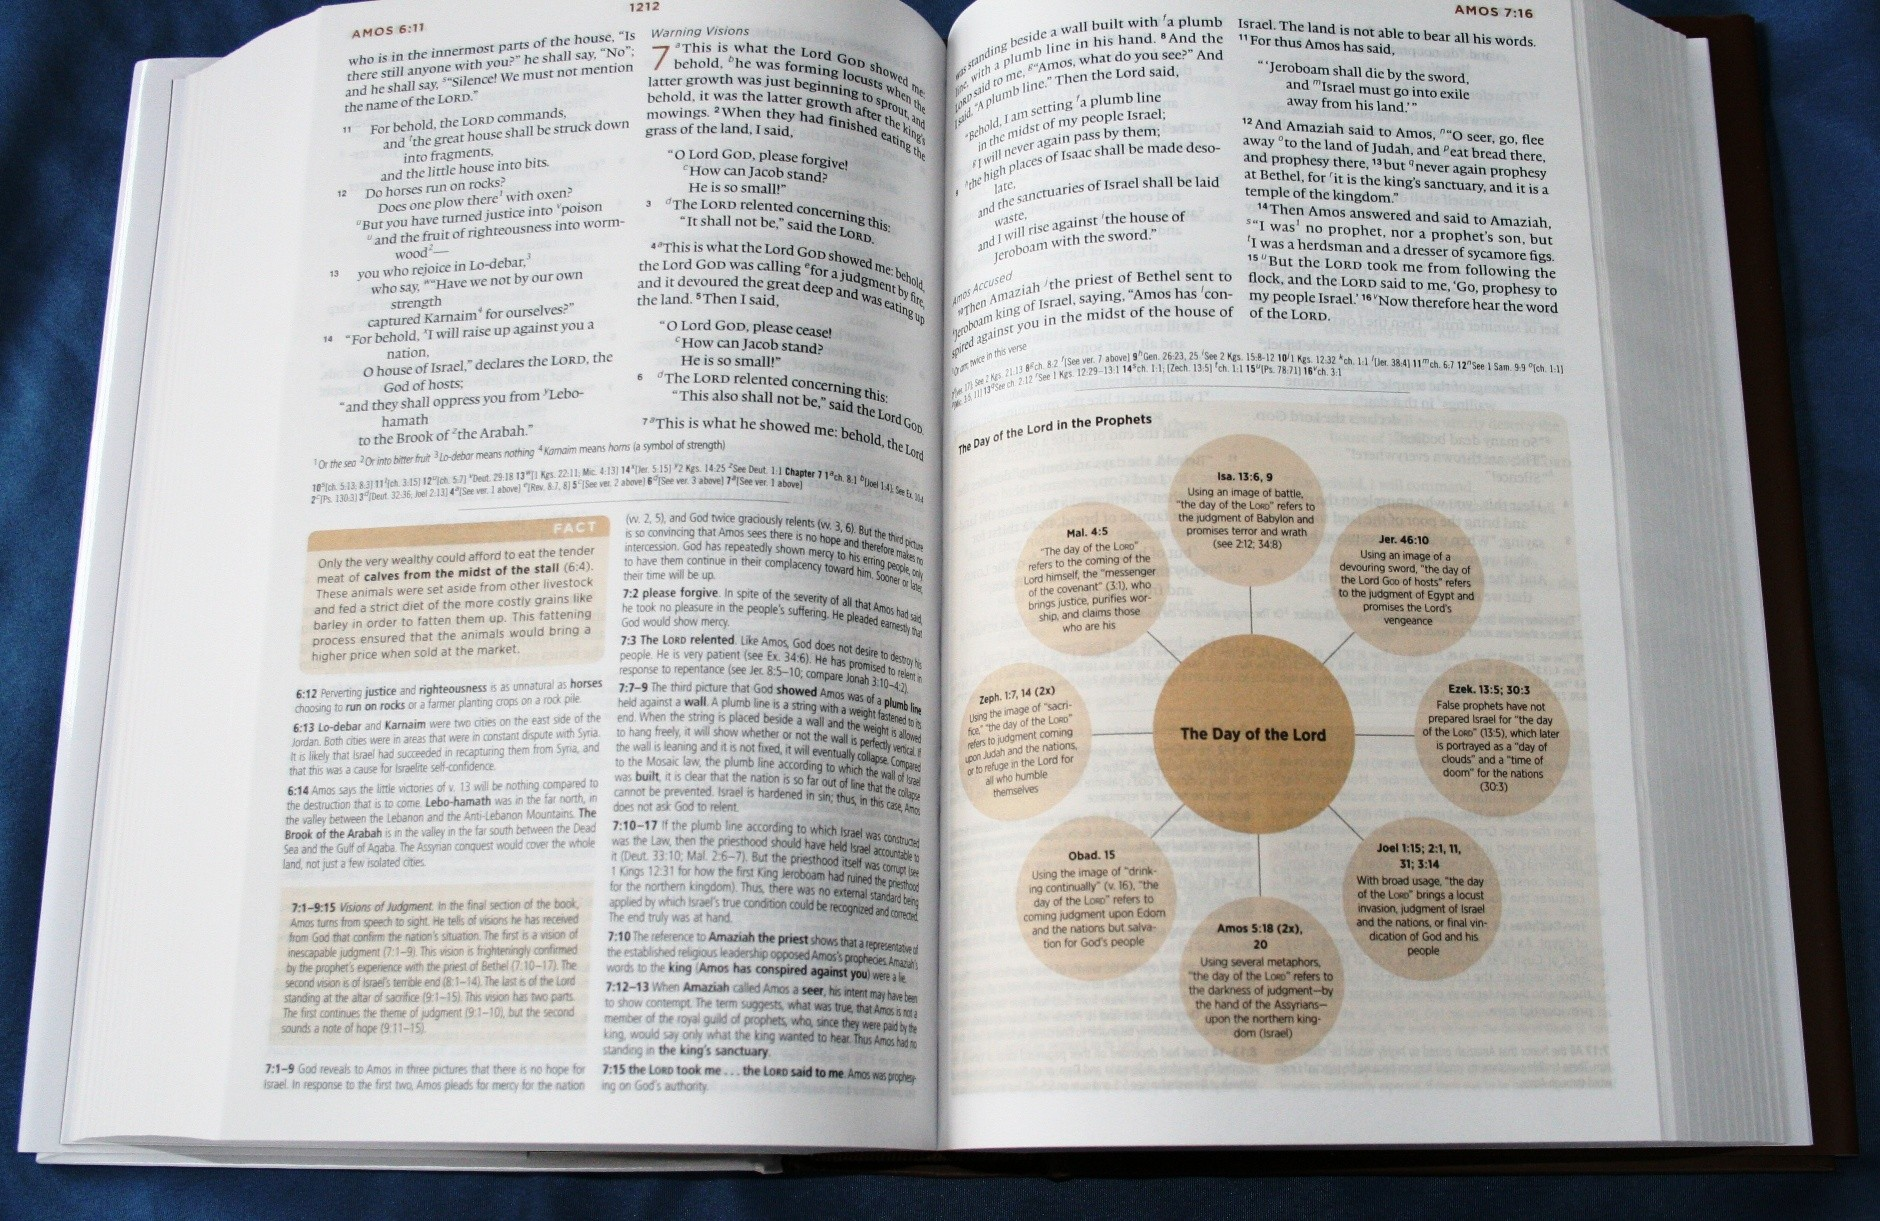 Crossway ESV Global Study Bible 011 - Bible Buying Guide